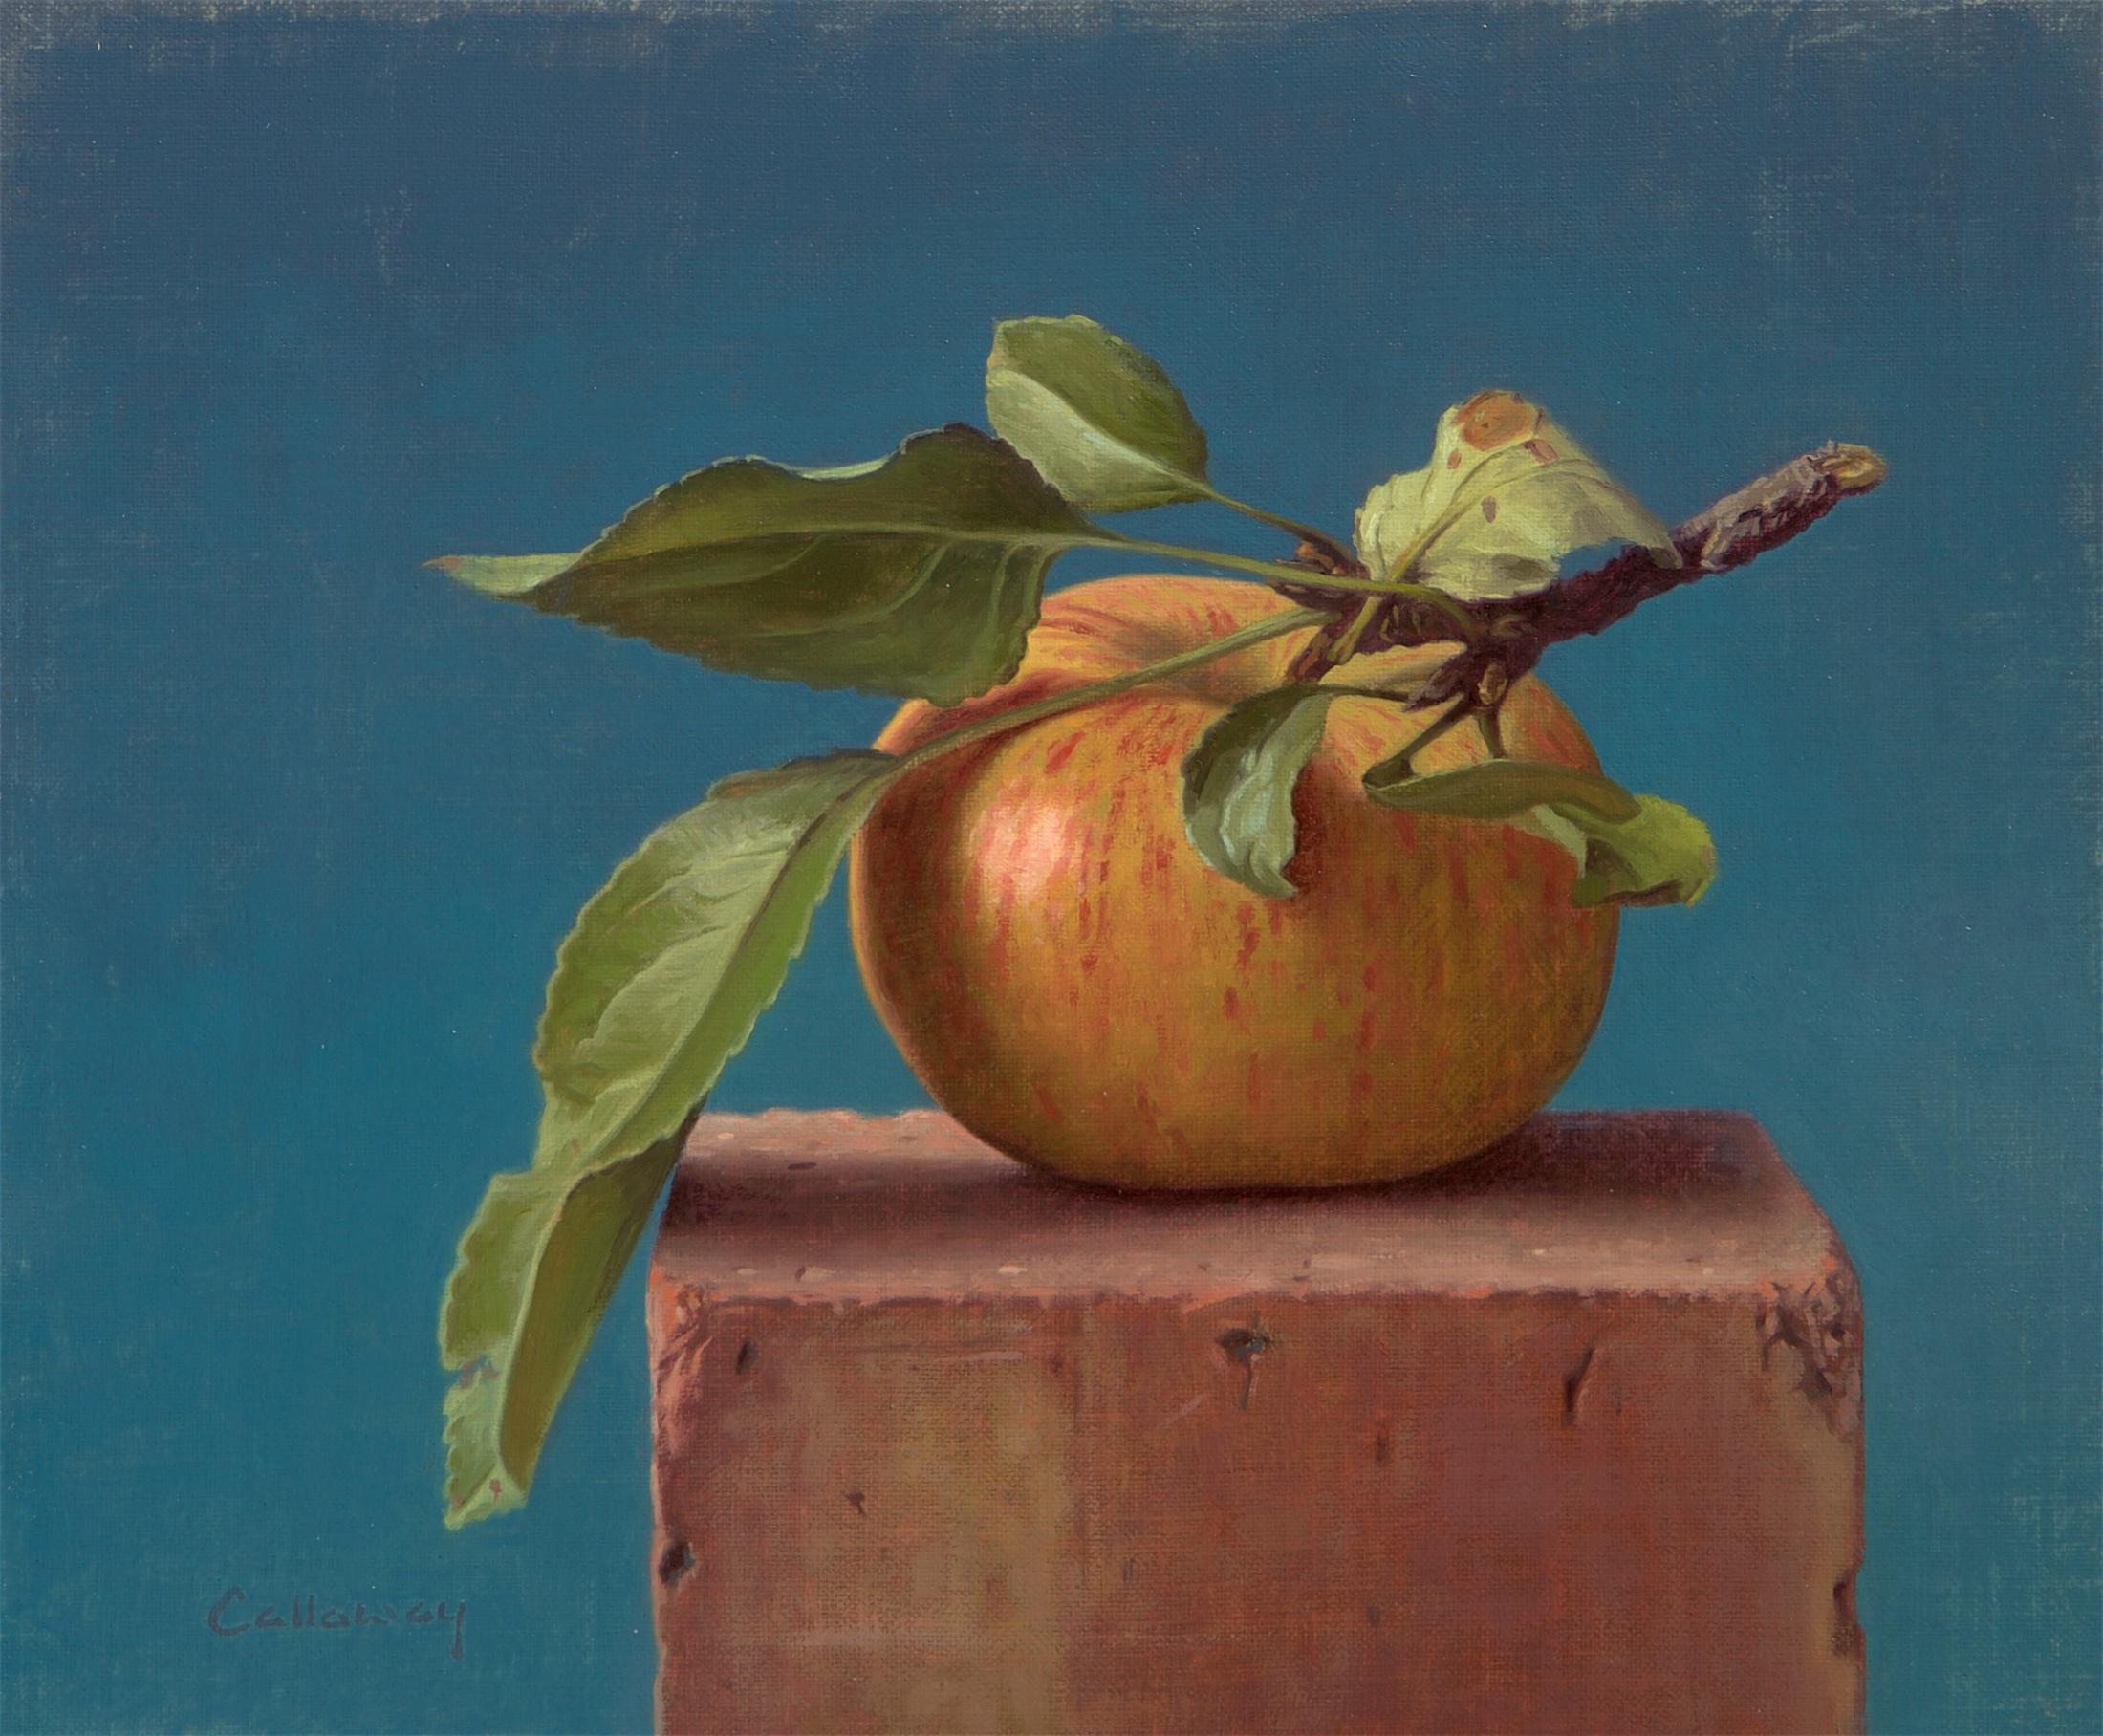 Alex Callaway, Apple on a Brick II, Oil, 25cmx30cmx0.5cm,  http://www.alexcallaway.com